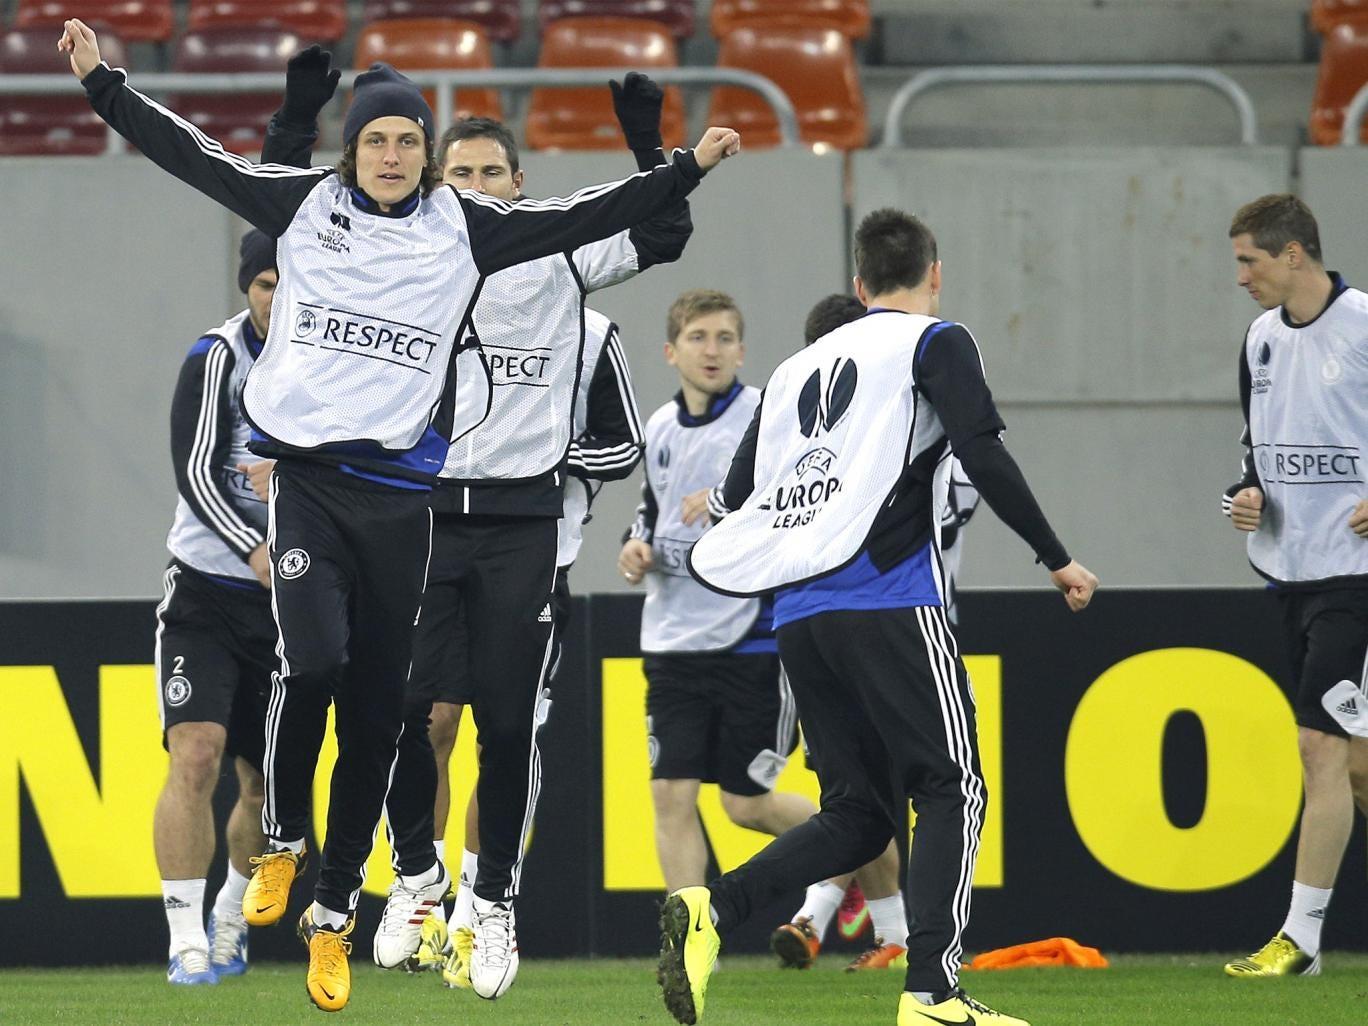 Chelsea's David Luiz trains ahead of tonight's game in Bucharest